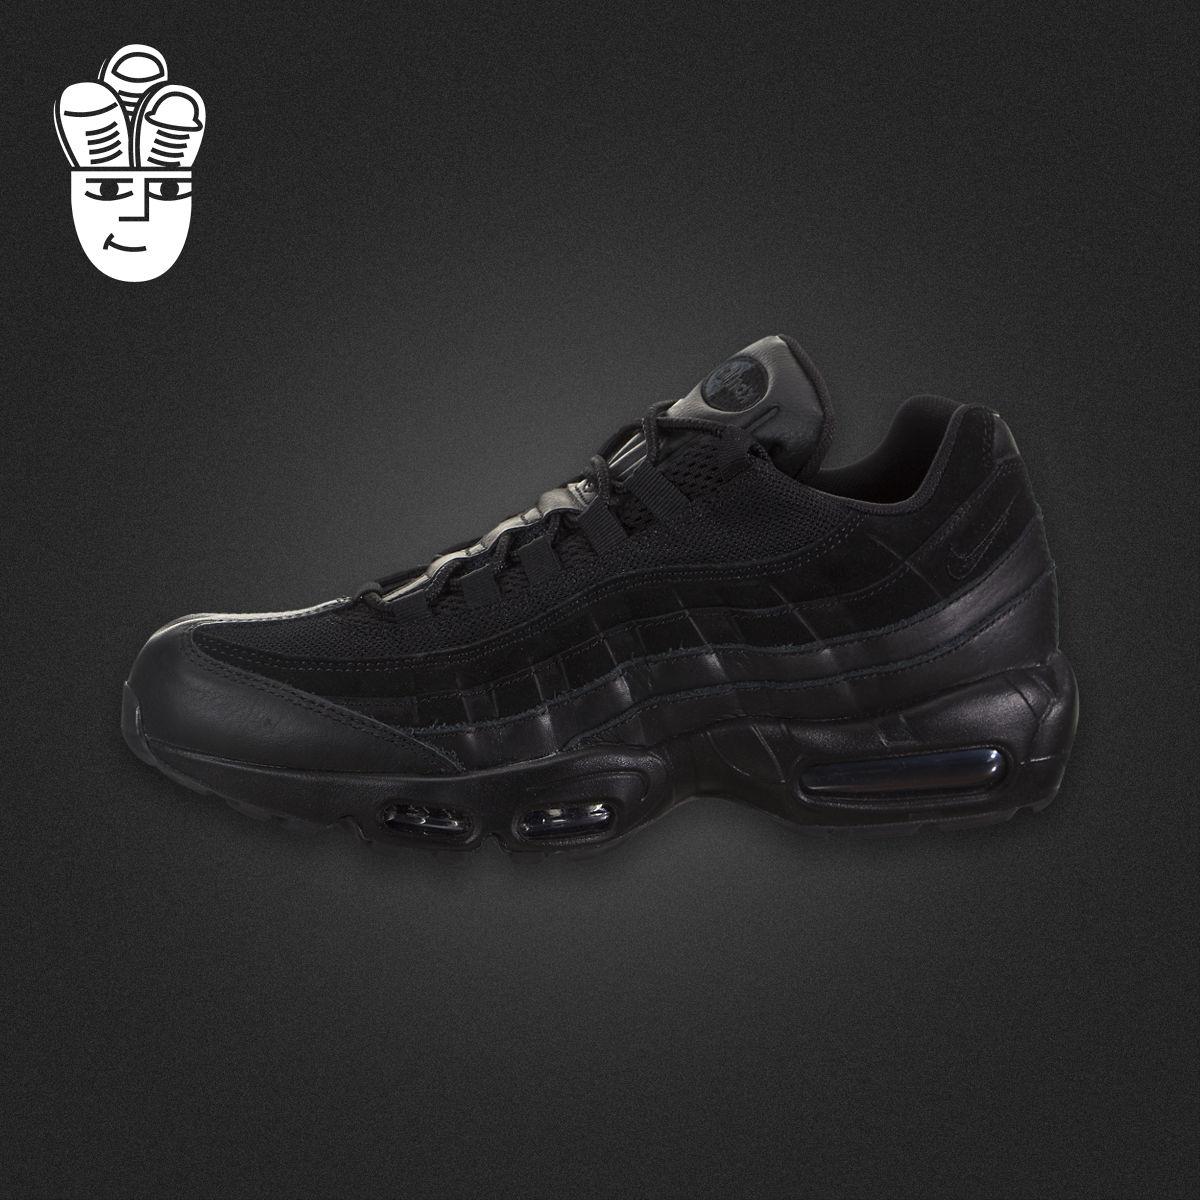 Nike Air Max 95 Pre 耐克男鞋 复古气垫跑步鞋 运动休闲鞋538416